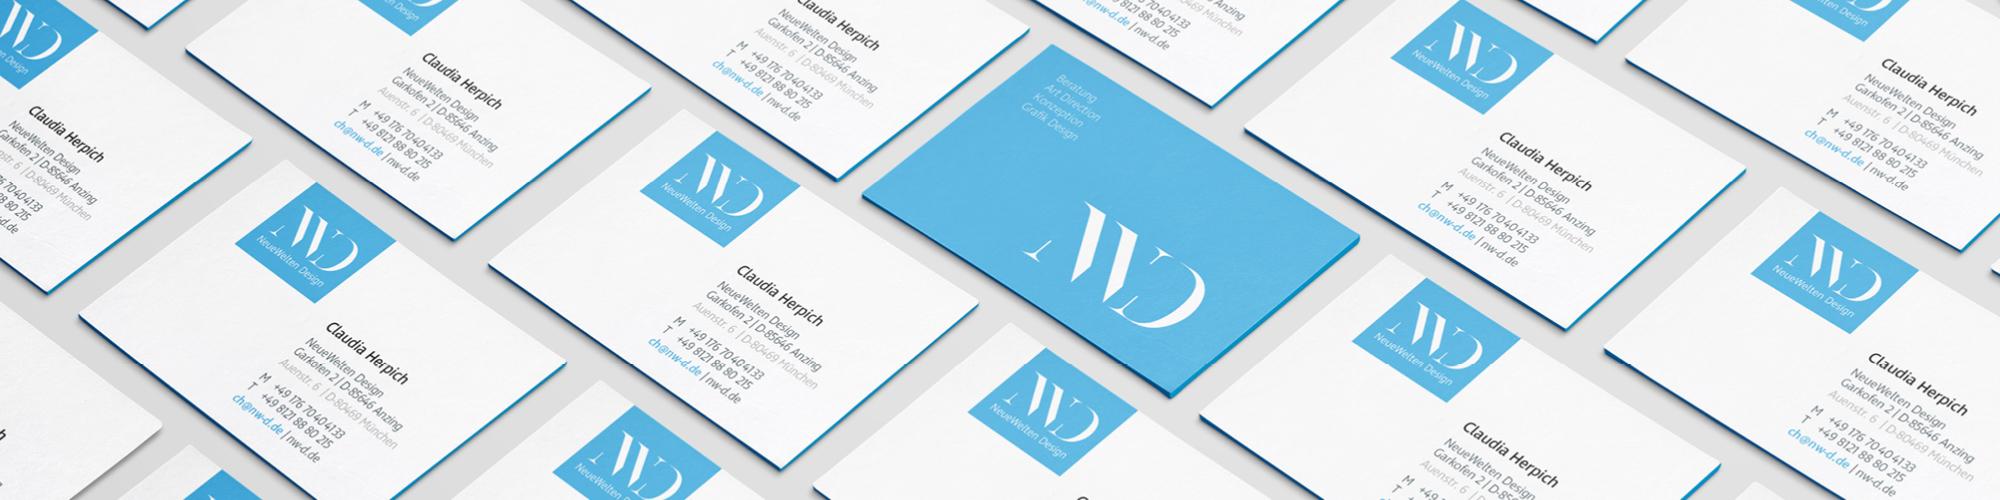 Corporate Design Nw D Neue Welten Design